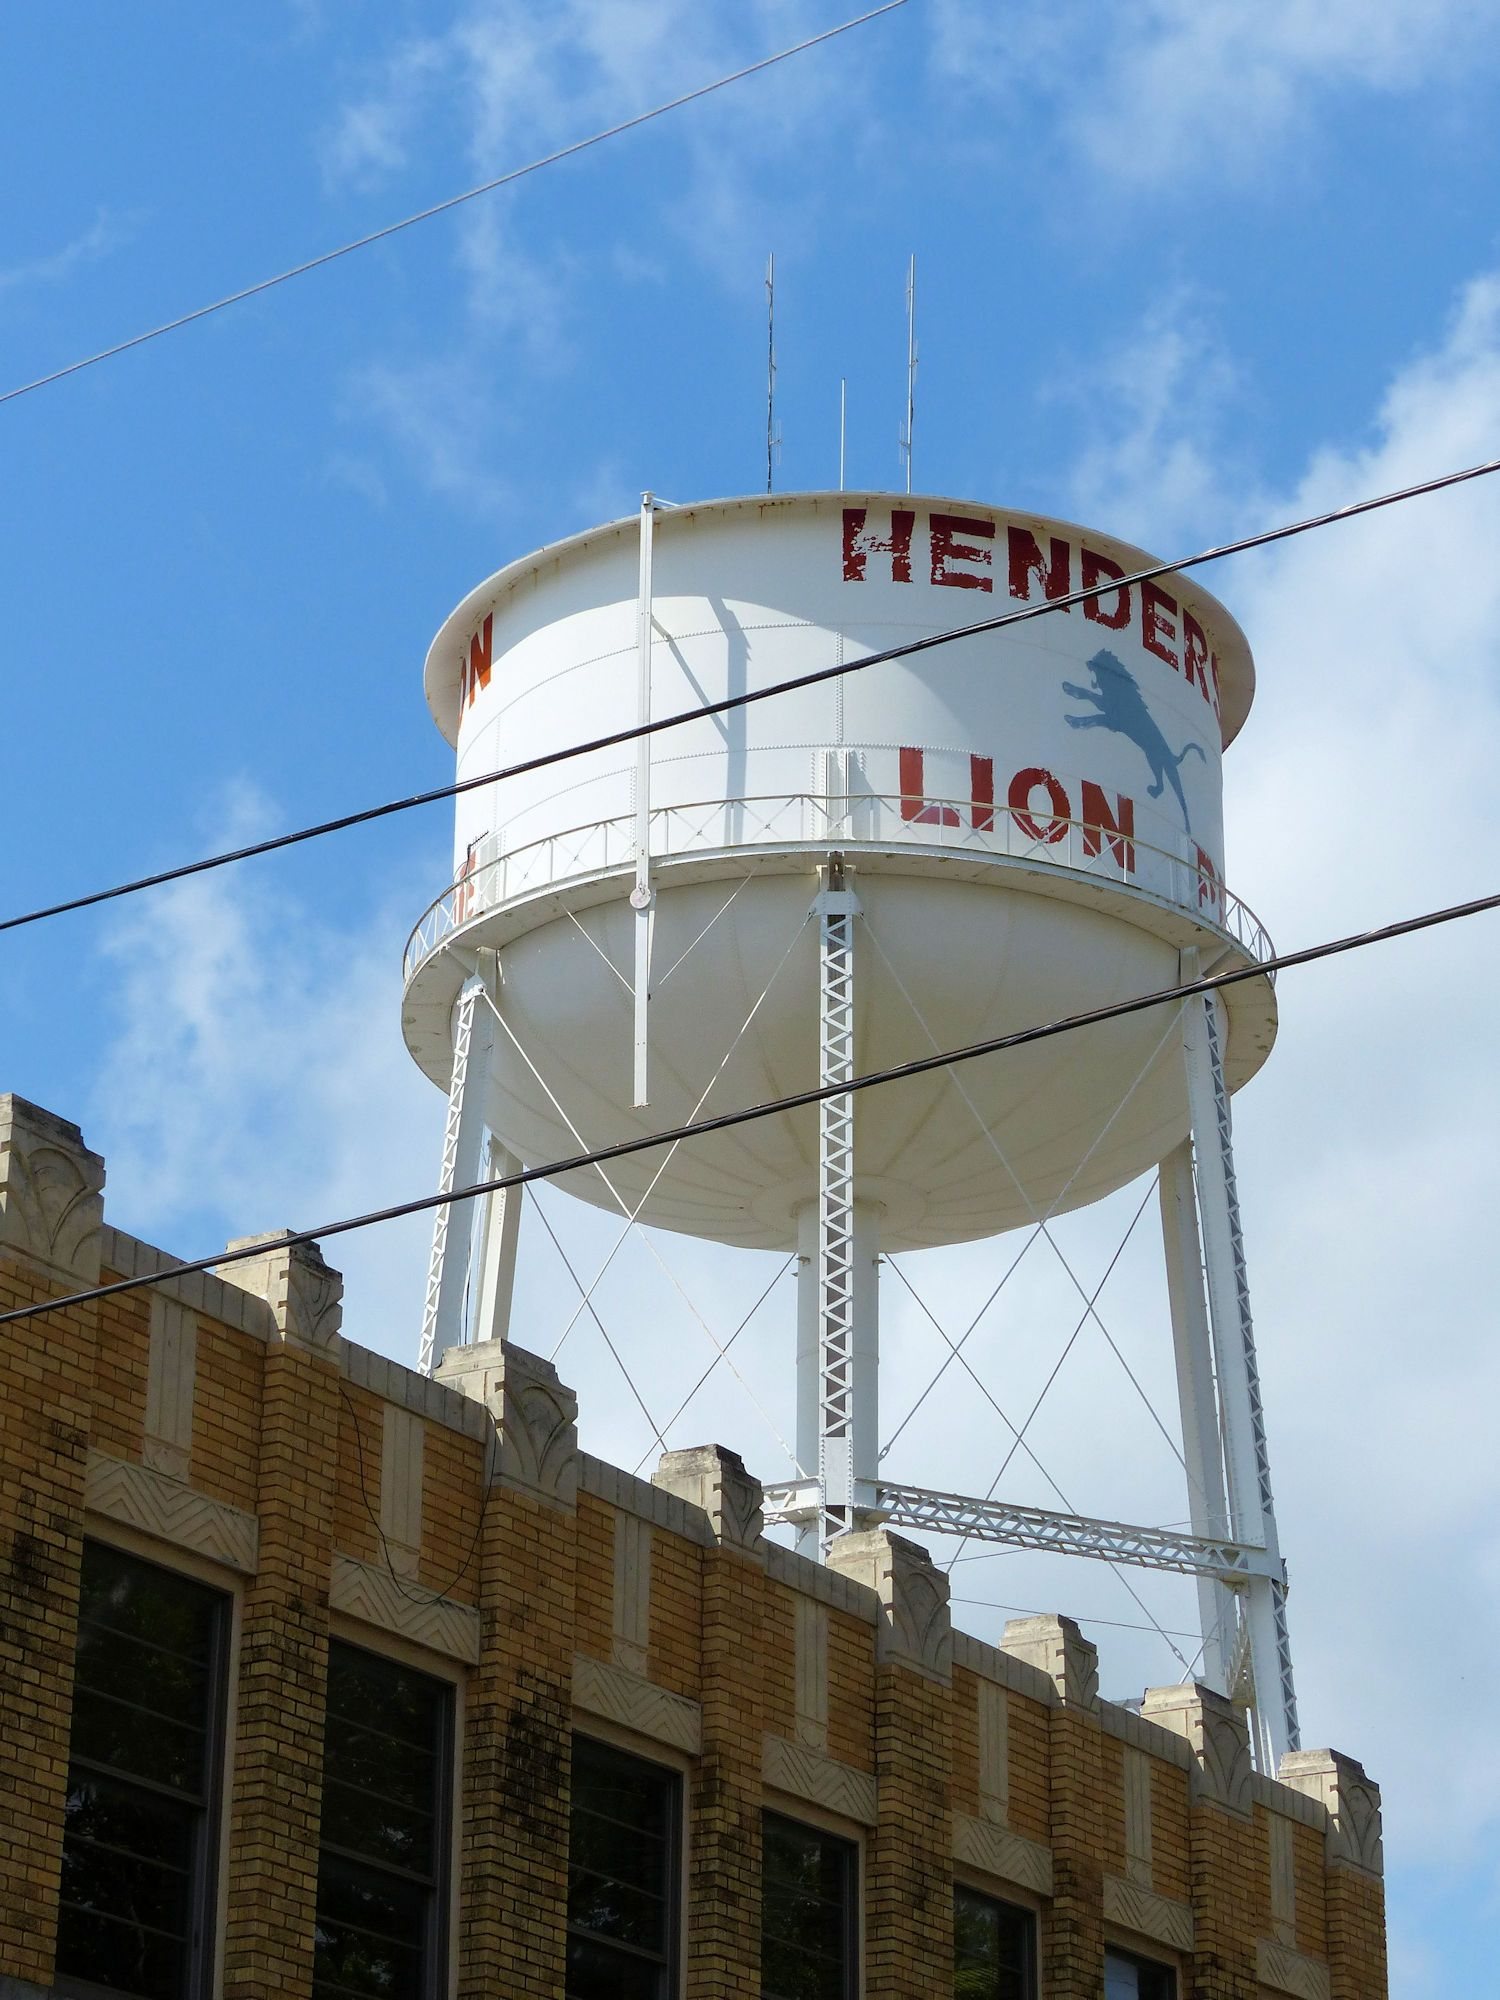 Henderson water tower